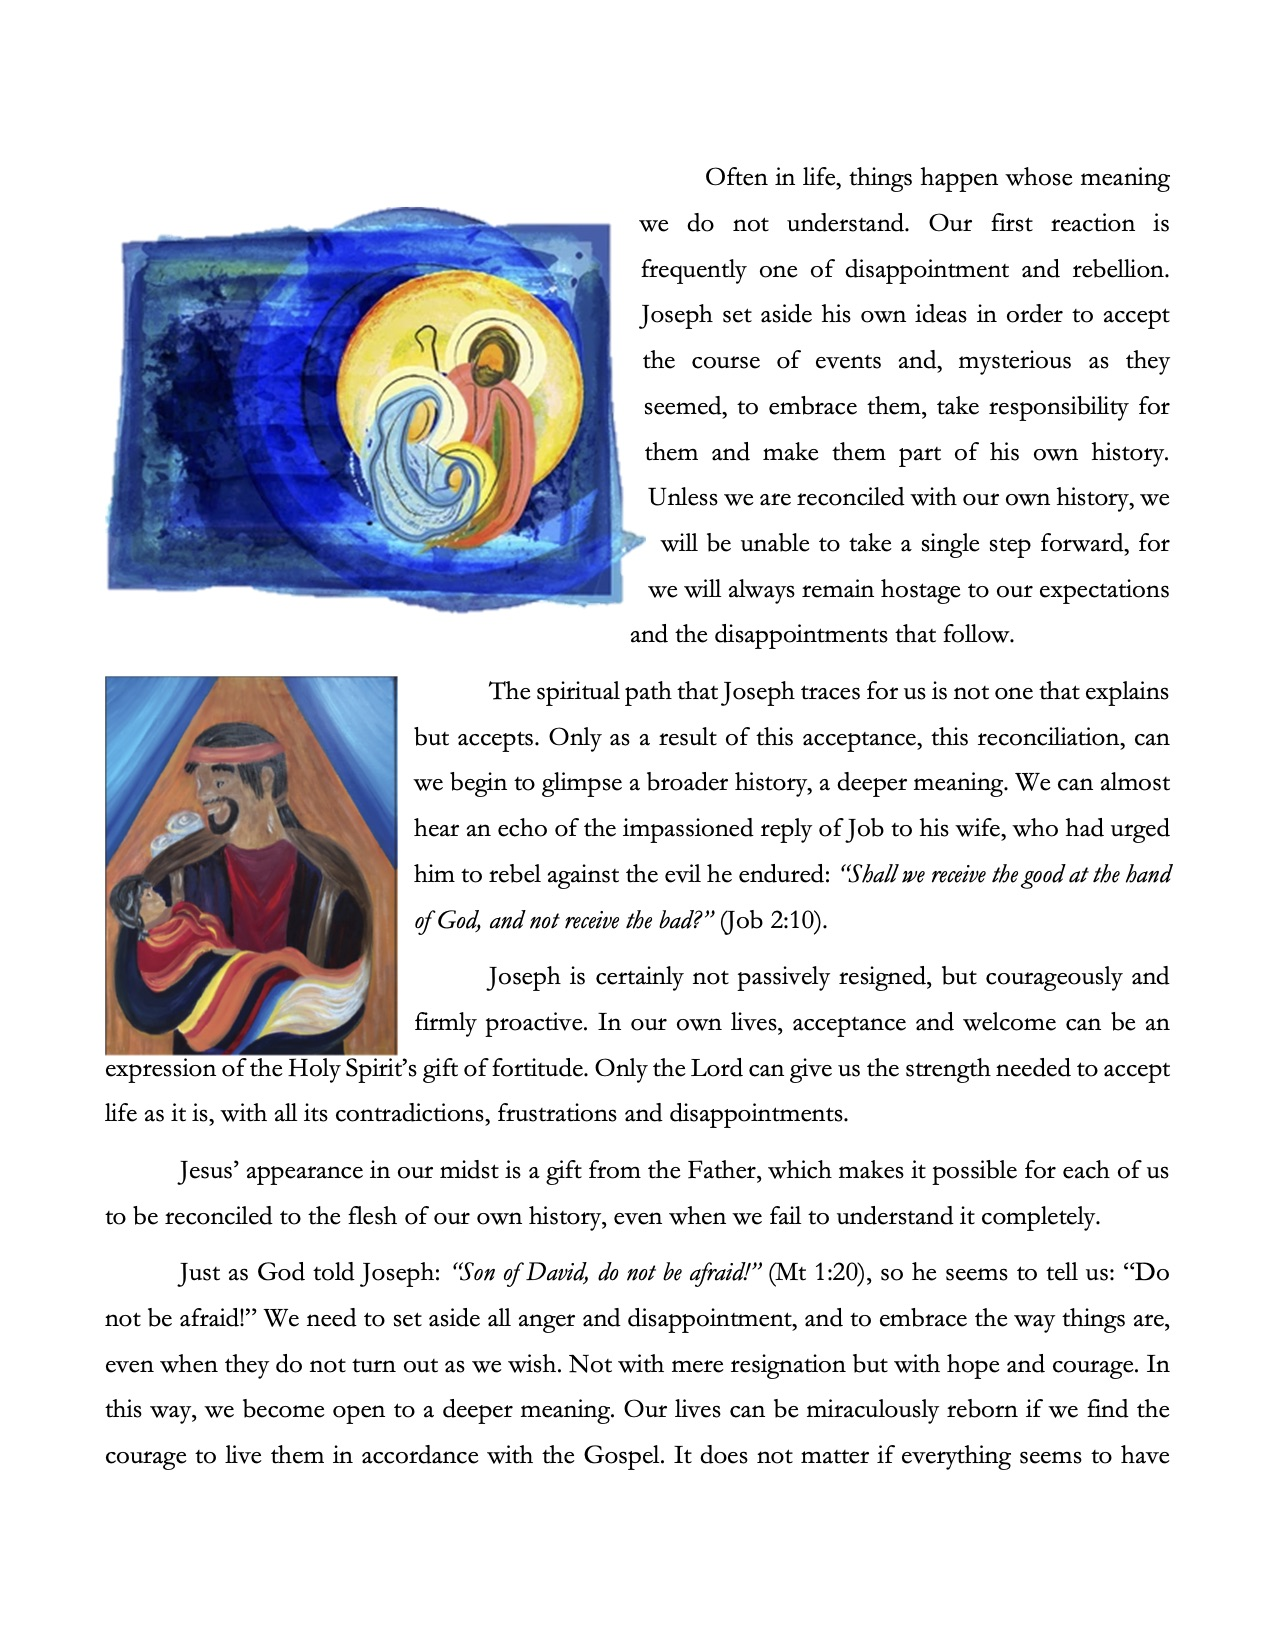 08-APOSTOLIC LETTER